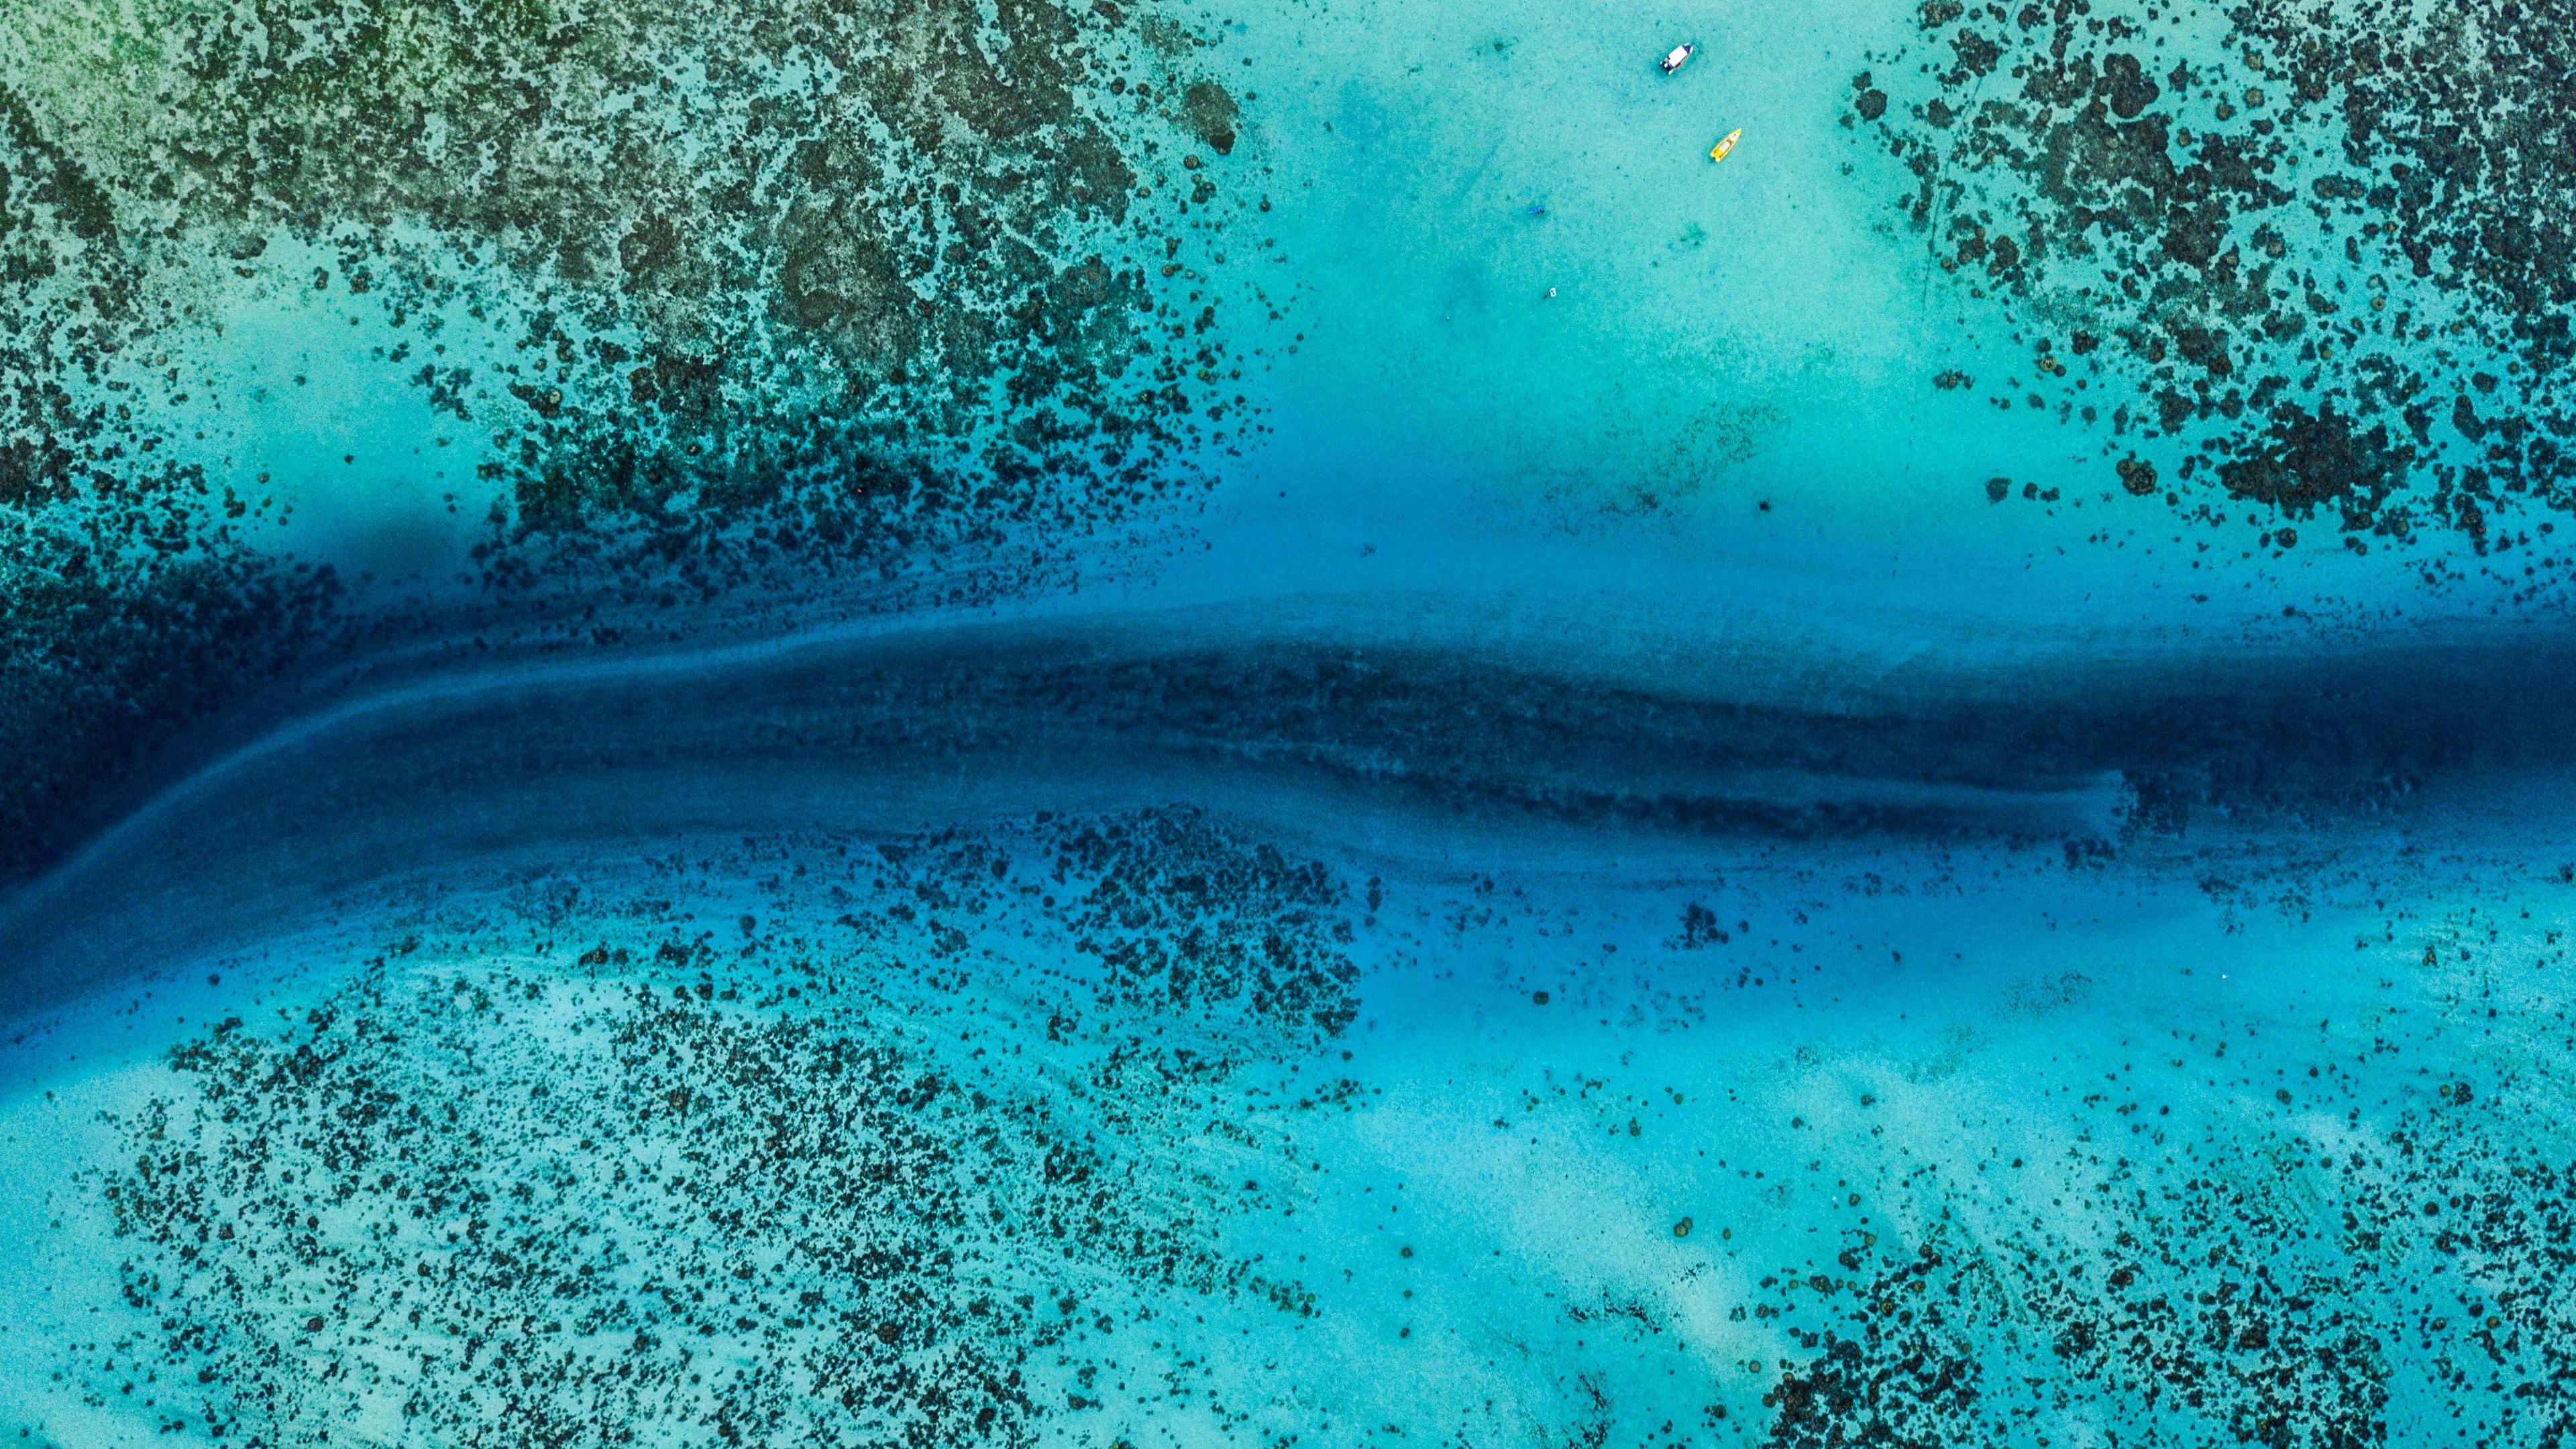 ocean drone view 4k 1551644063 - Ocean Drone View 4k - ocean wallpapers, nature wallpapers, hd-wallpapers, drone view wallpapers, 4k-wallpapers